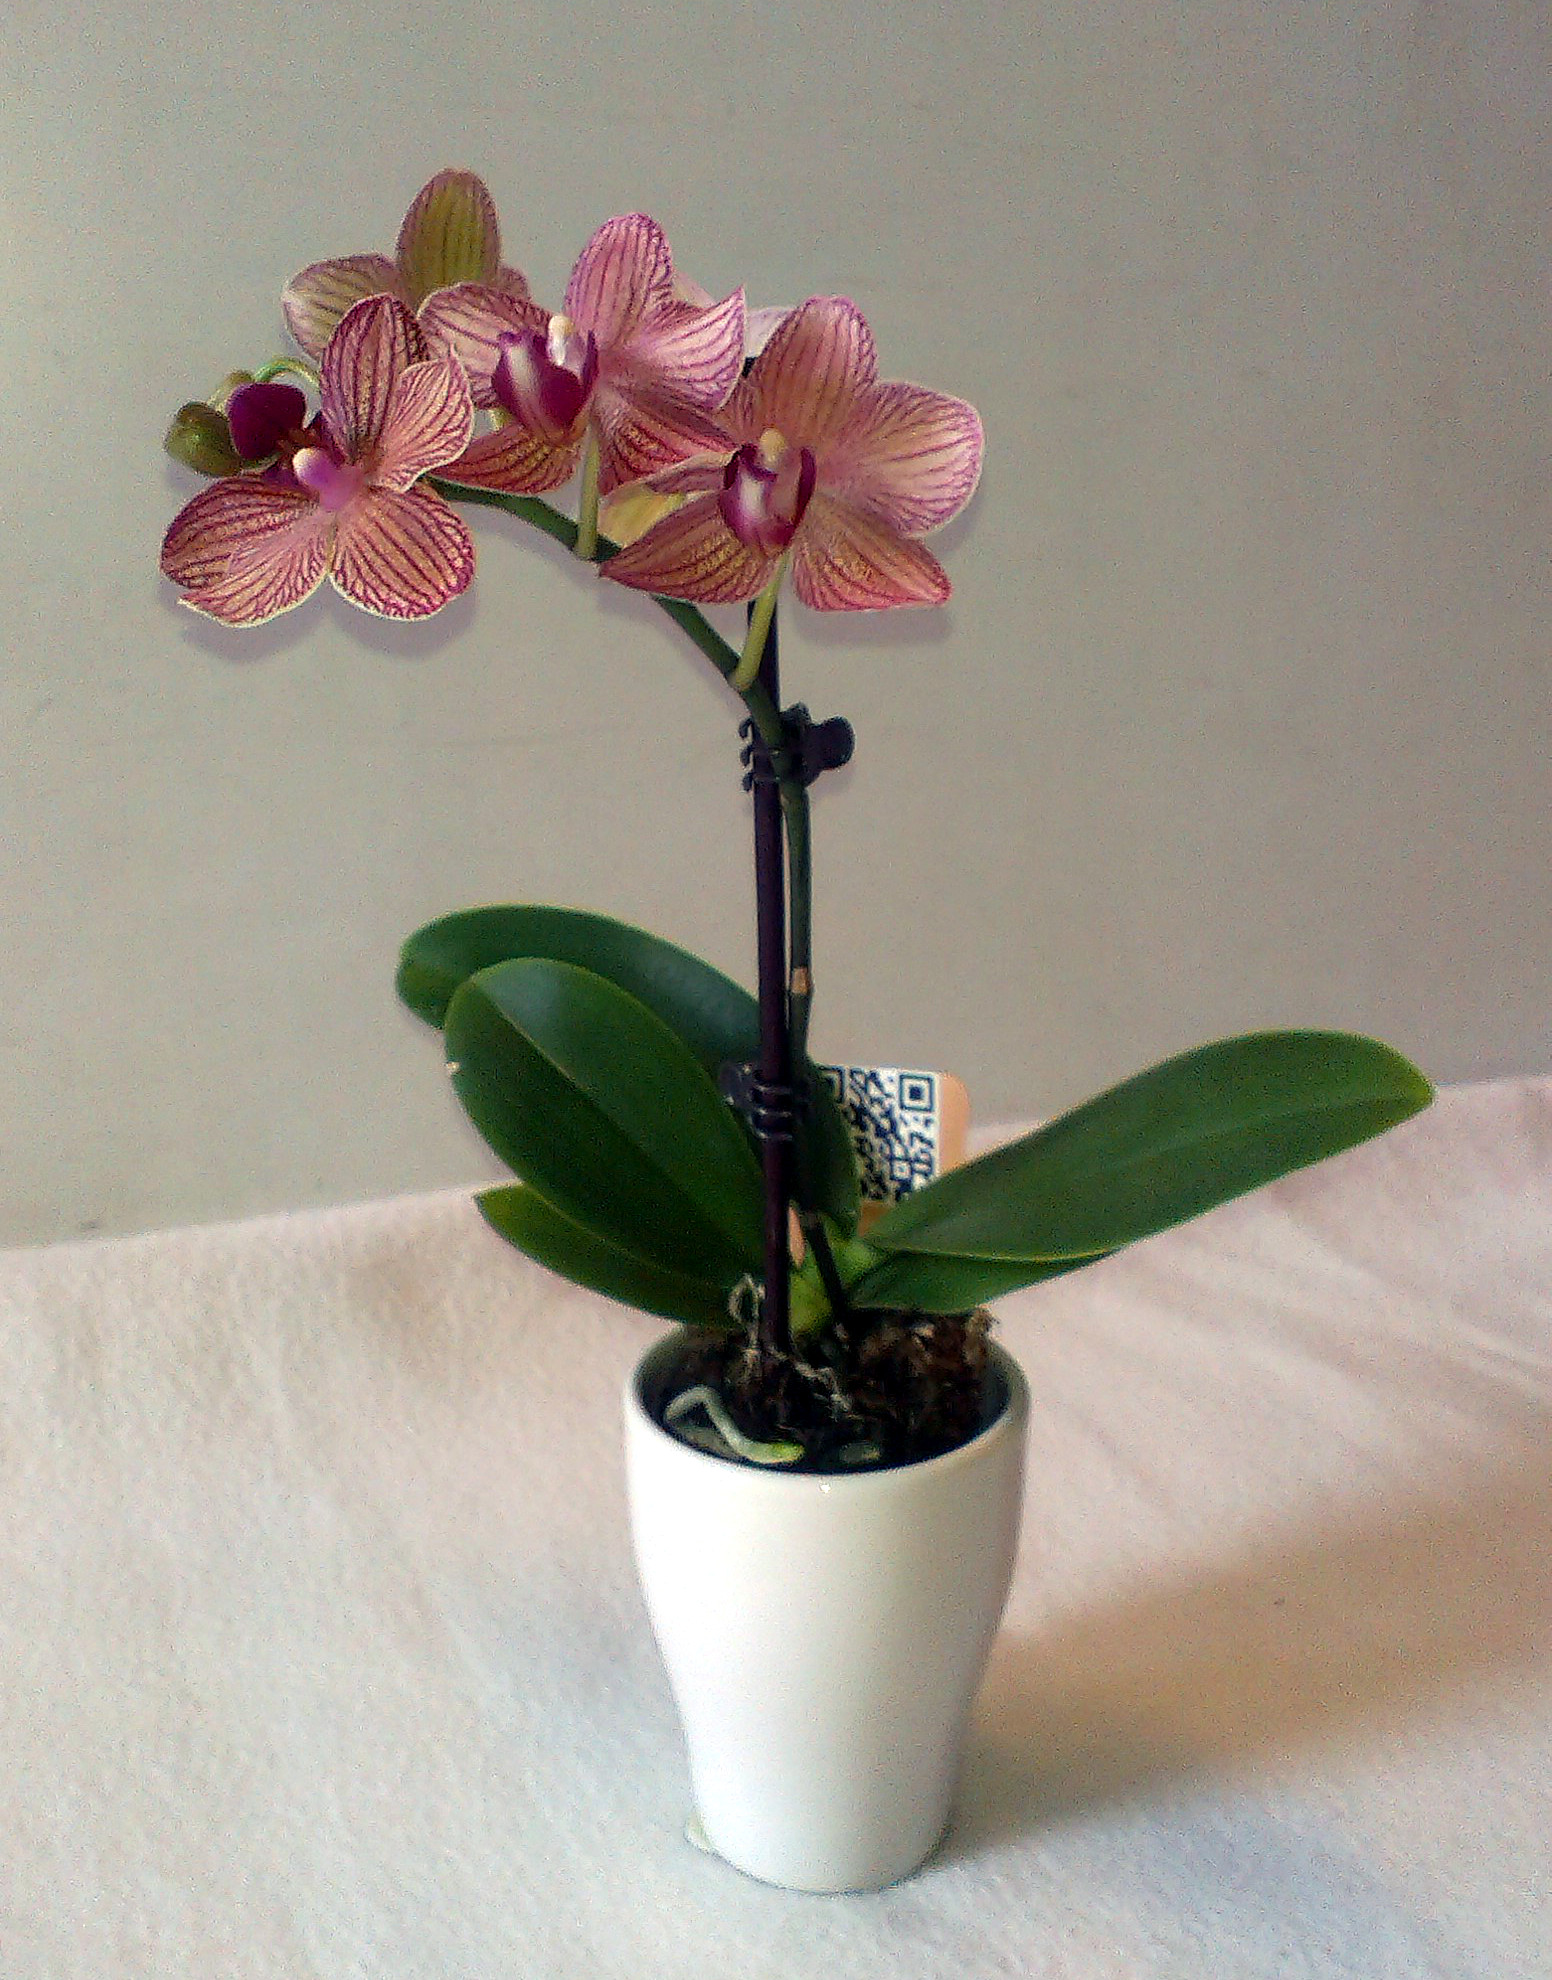 Lišejovec /Phalaenopsis/